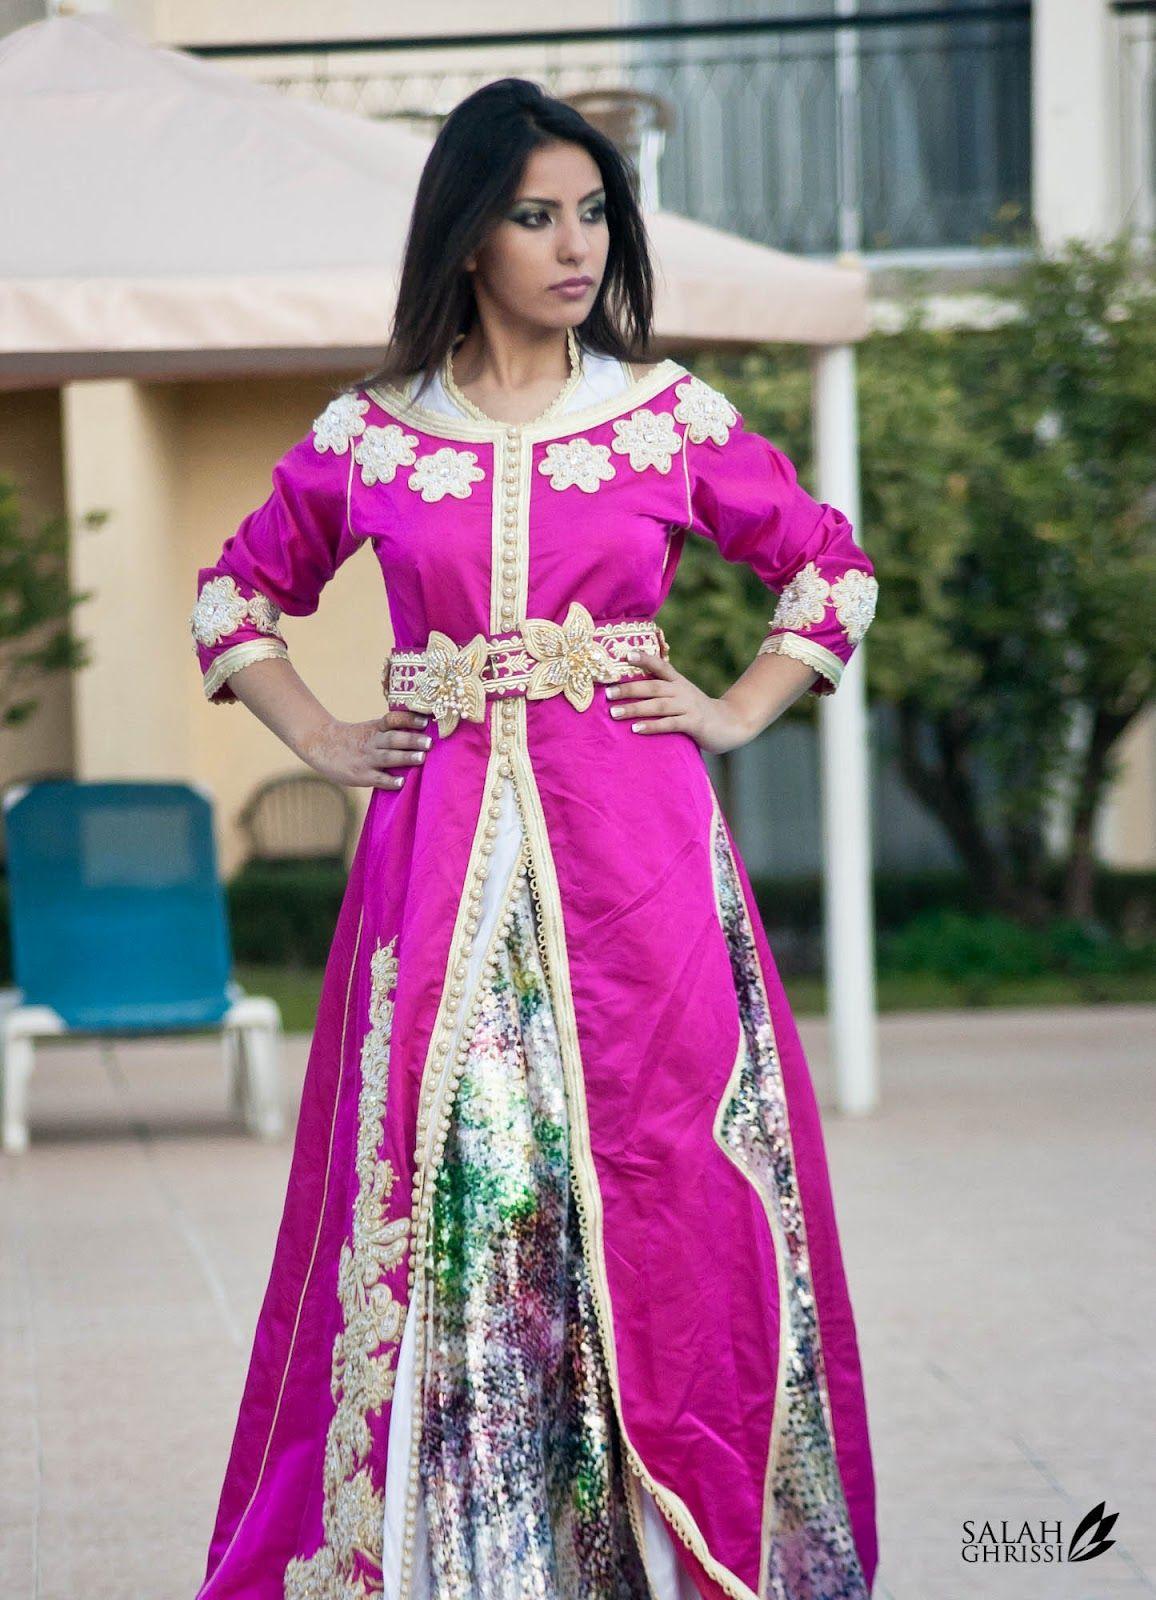 Caftan style jihane echchiekhi par fadoua aoullay fashion maroc